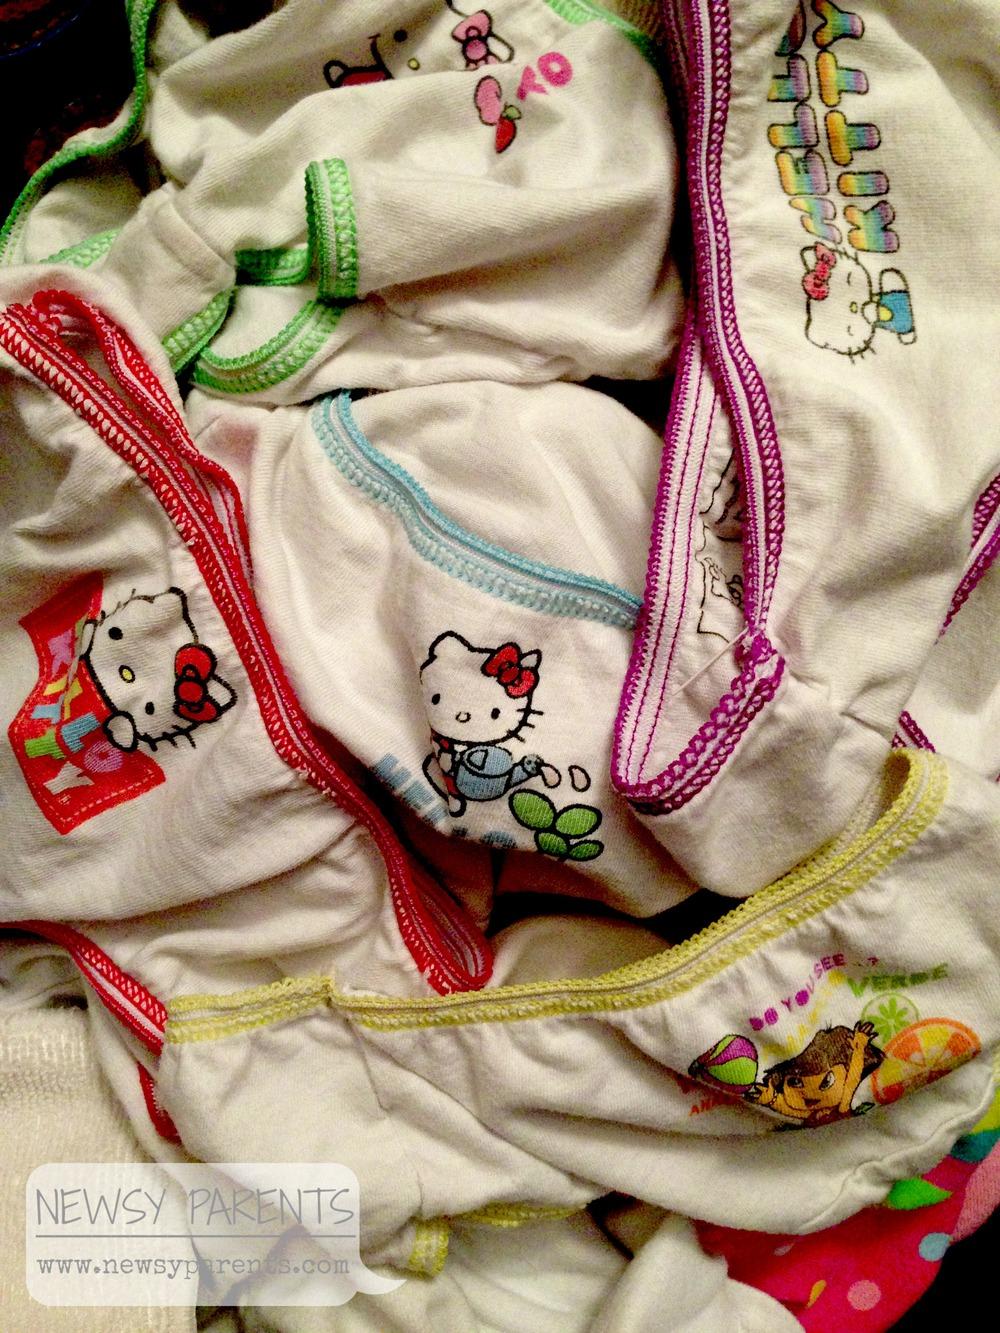 Potty-Training-Kids-Panties-Newsy-Parents